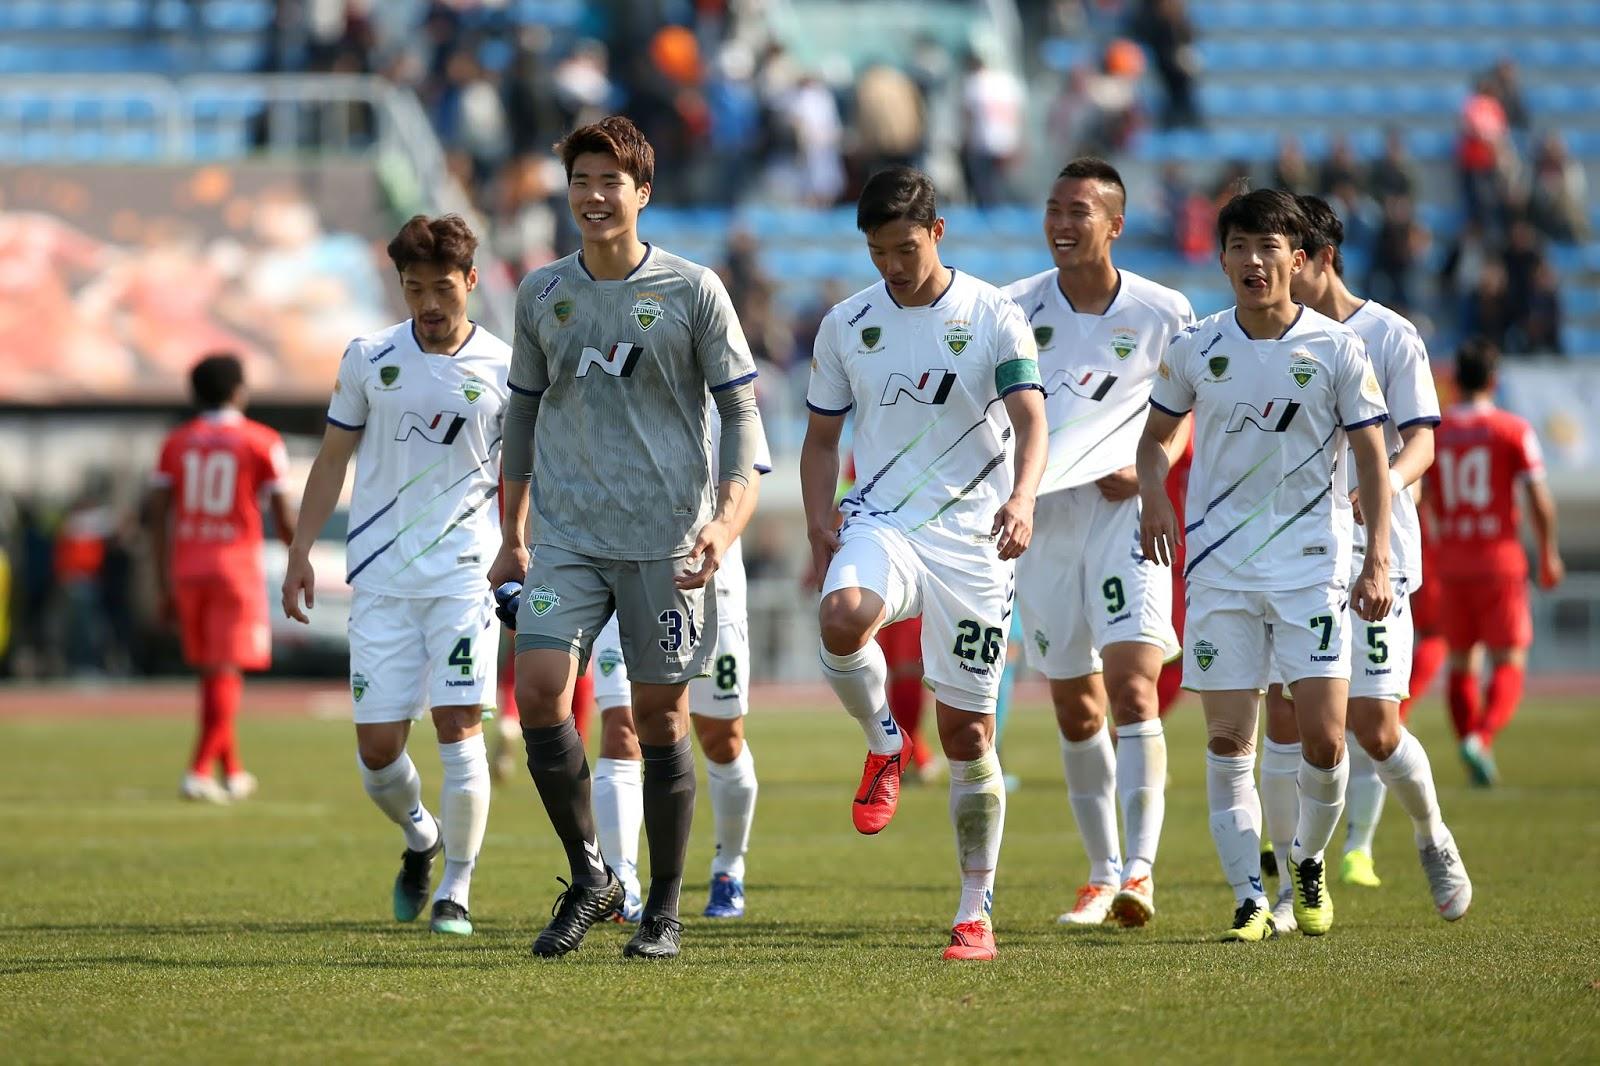 K League 1 Preview: Sangju Sangmu vs Jeonbuk Hyundai Motors